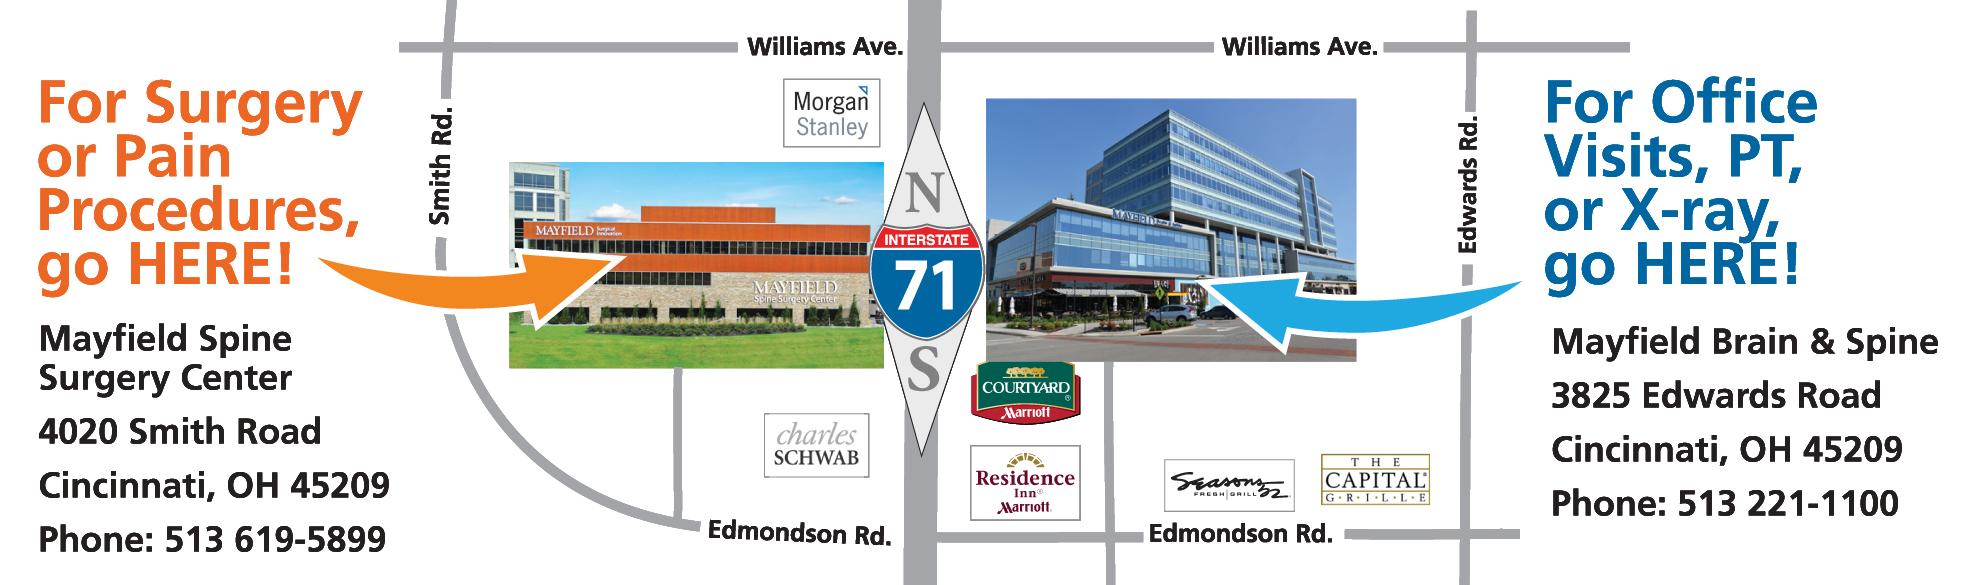 Procedures, Surgery = Surgery Center | Visits, PT, Xray = Rookwood Exchange Office